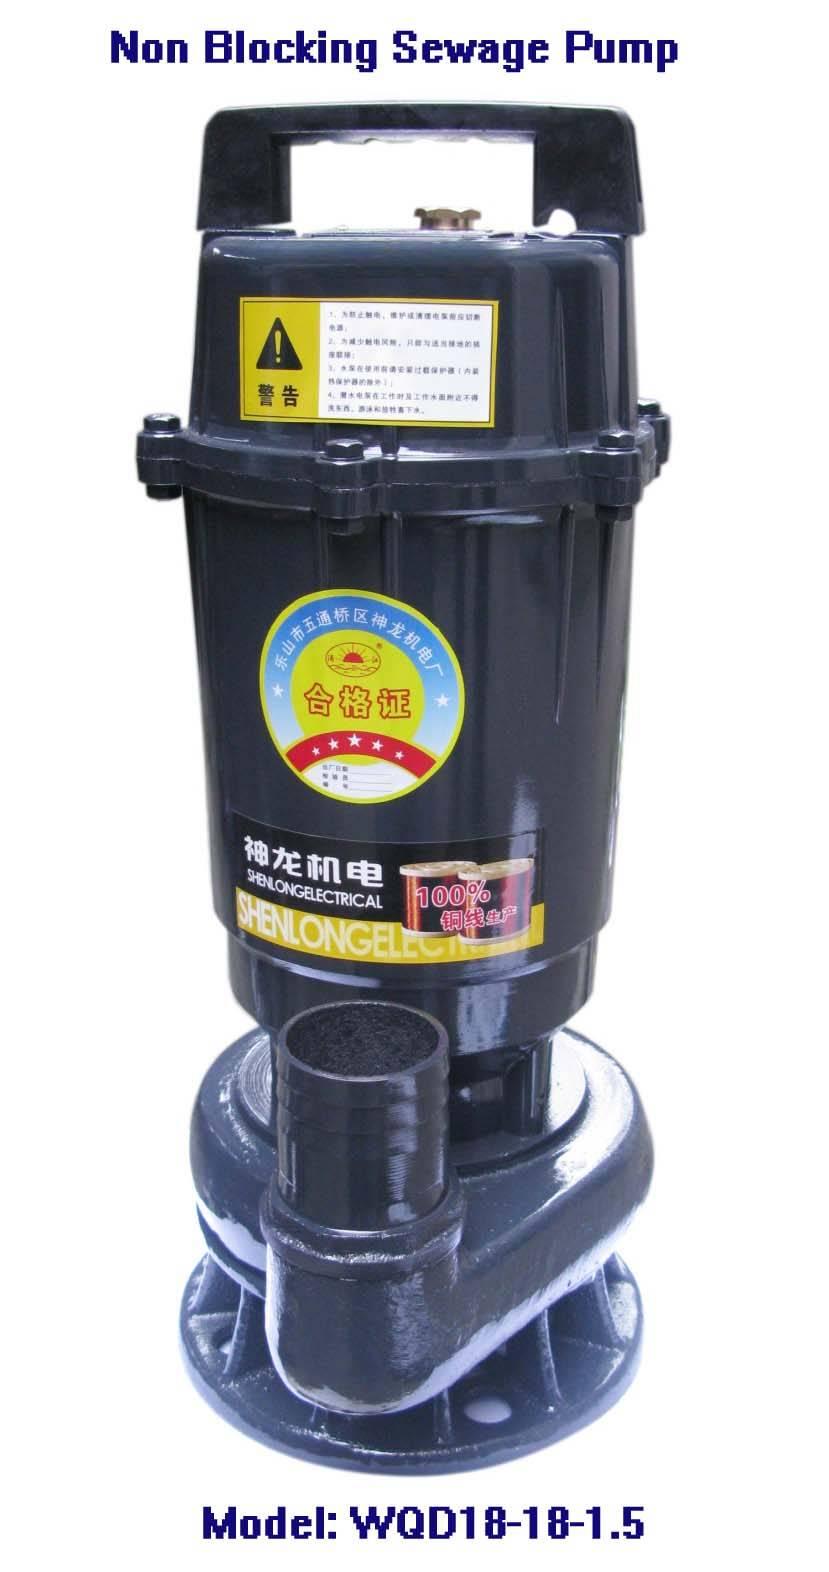 Electric Non-blocking Sewage Pump-WQD18-18-1.5, AL Tube